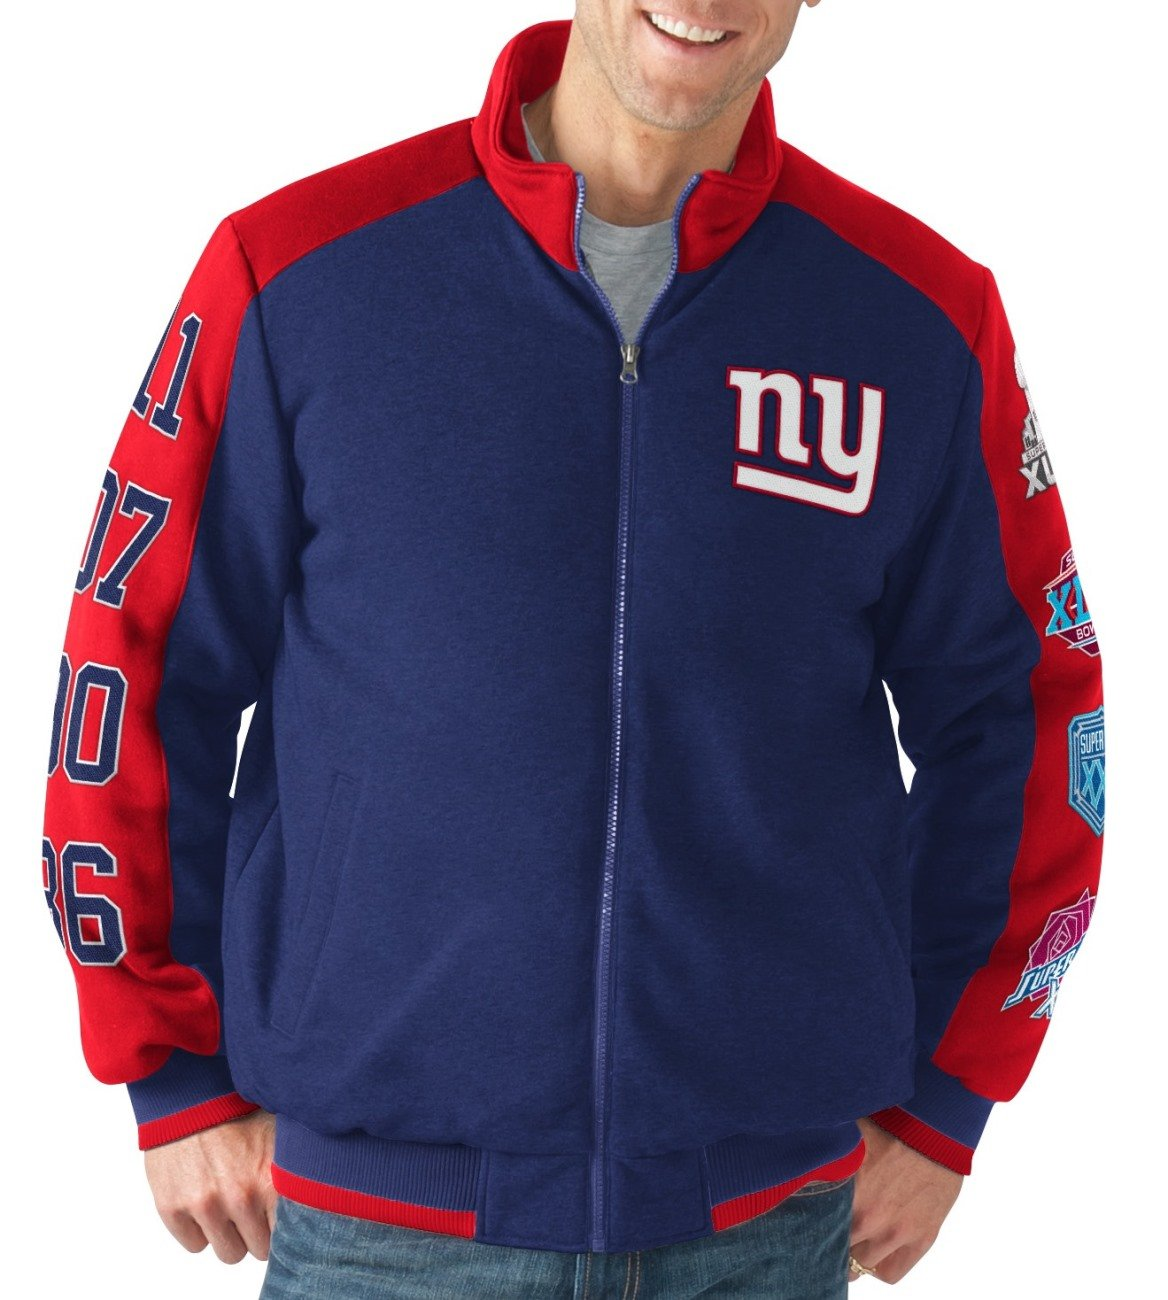 c87cf0829 Amazon.com : G-III Sports New York Giants NFL Classic Men's Super ...